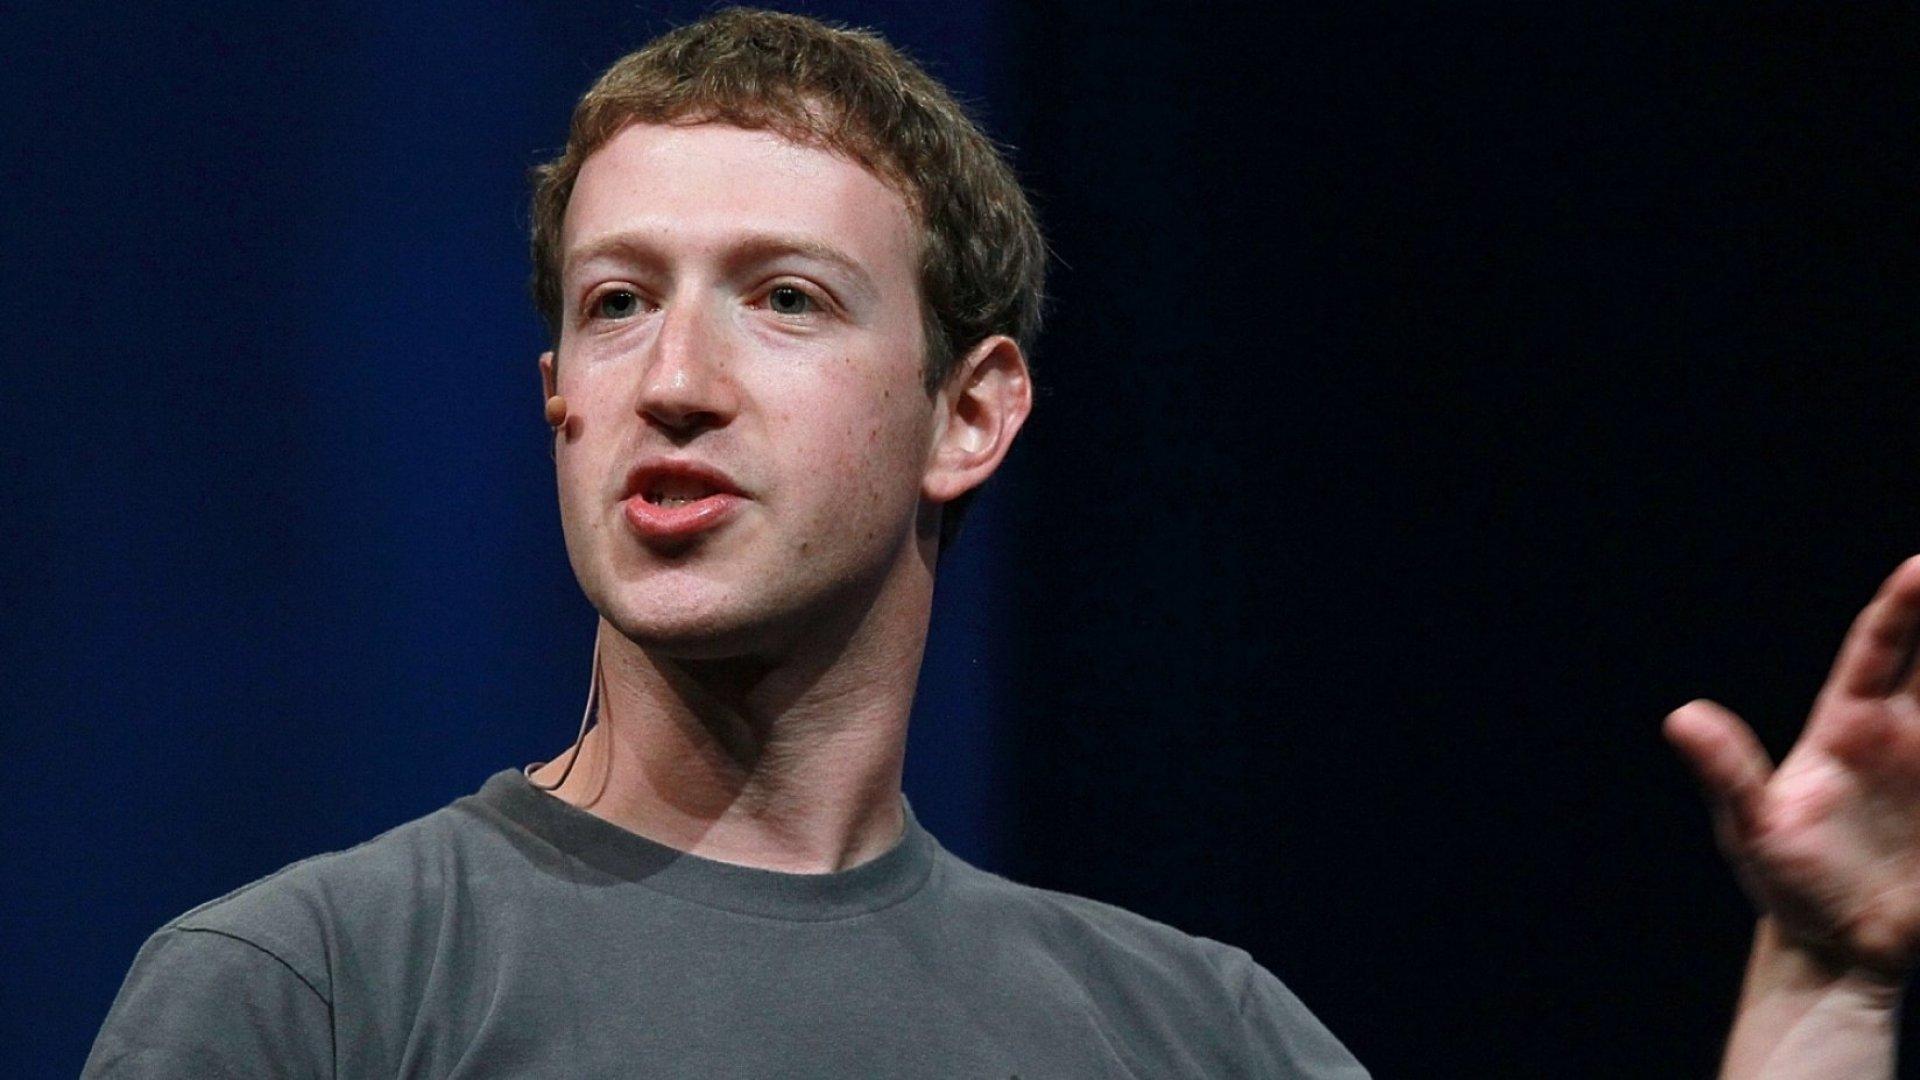 Mark Zuckerberg, co-founder and CEO of Facebook.